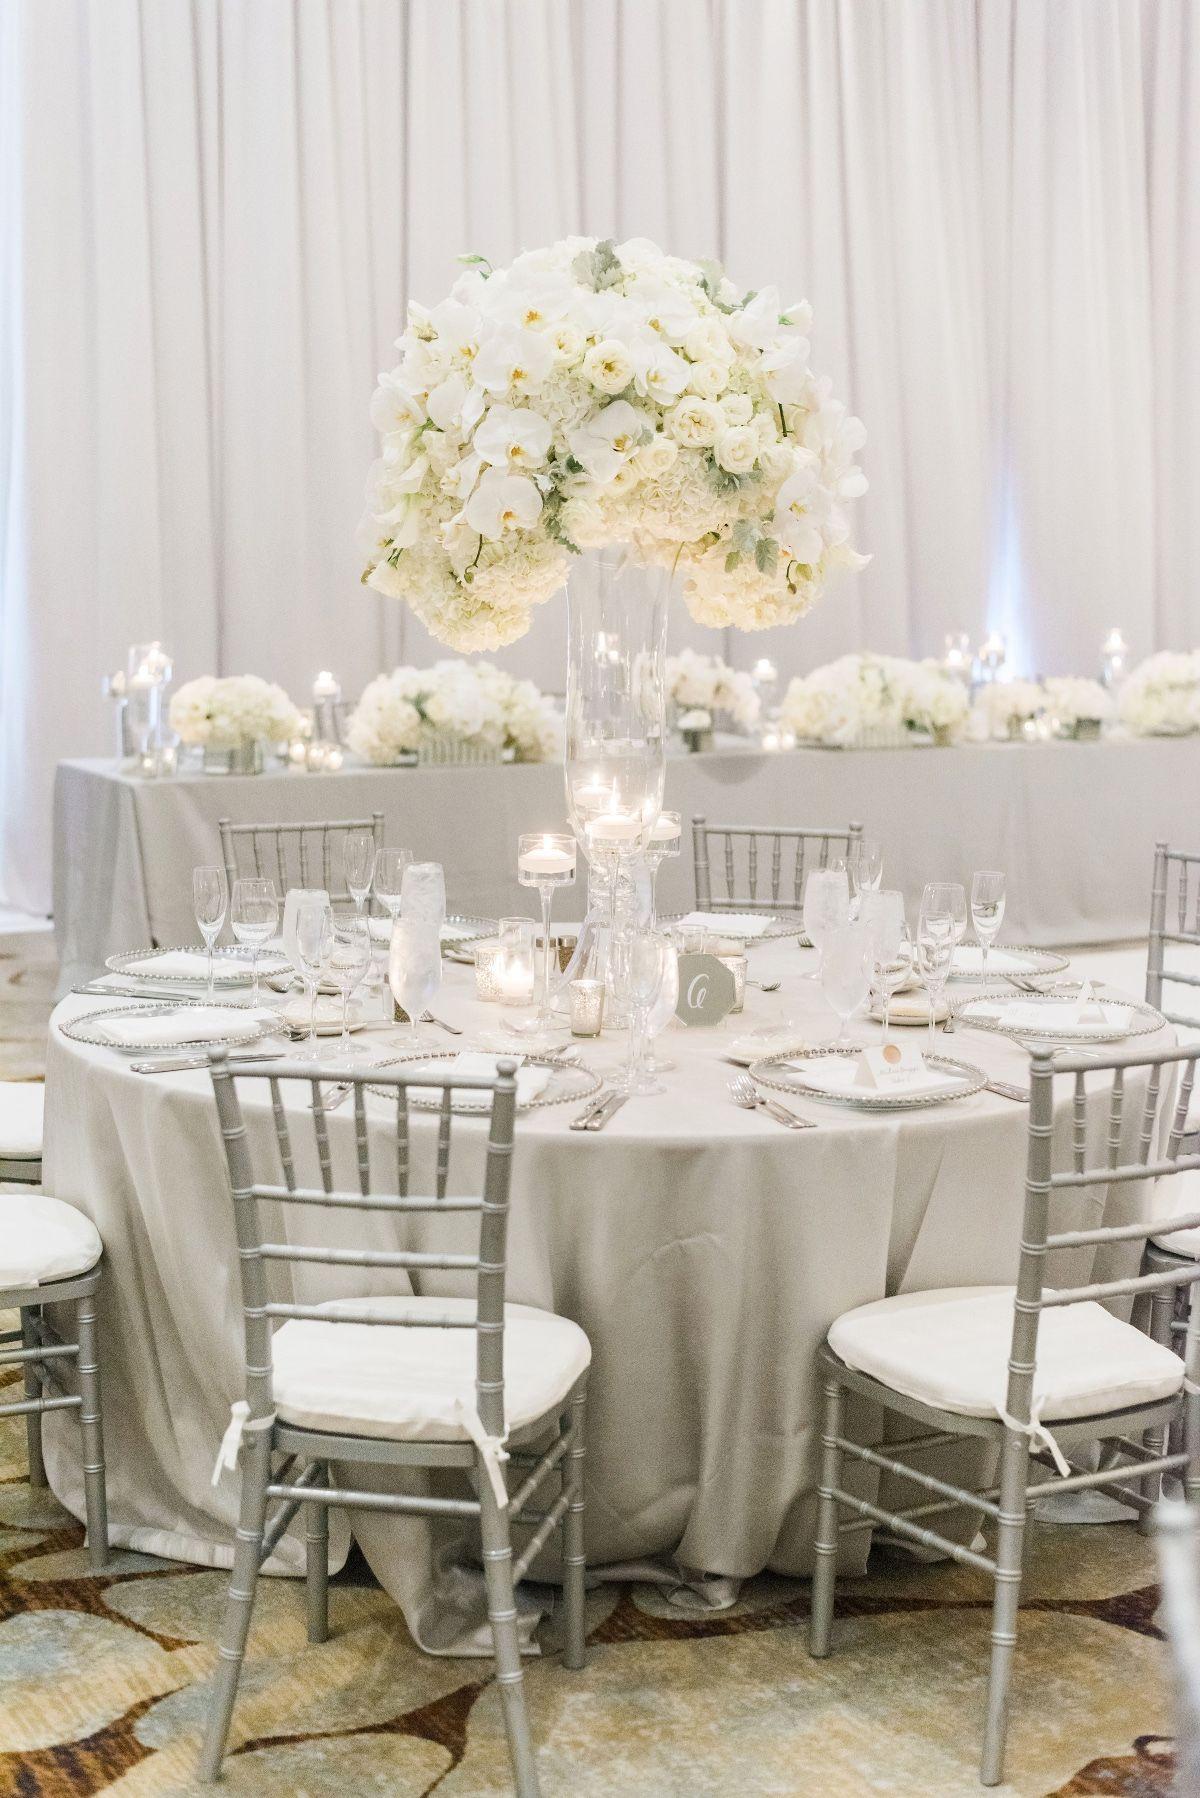 Luxury Glam Wedding in Silver and White | White wedding ...